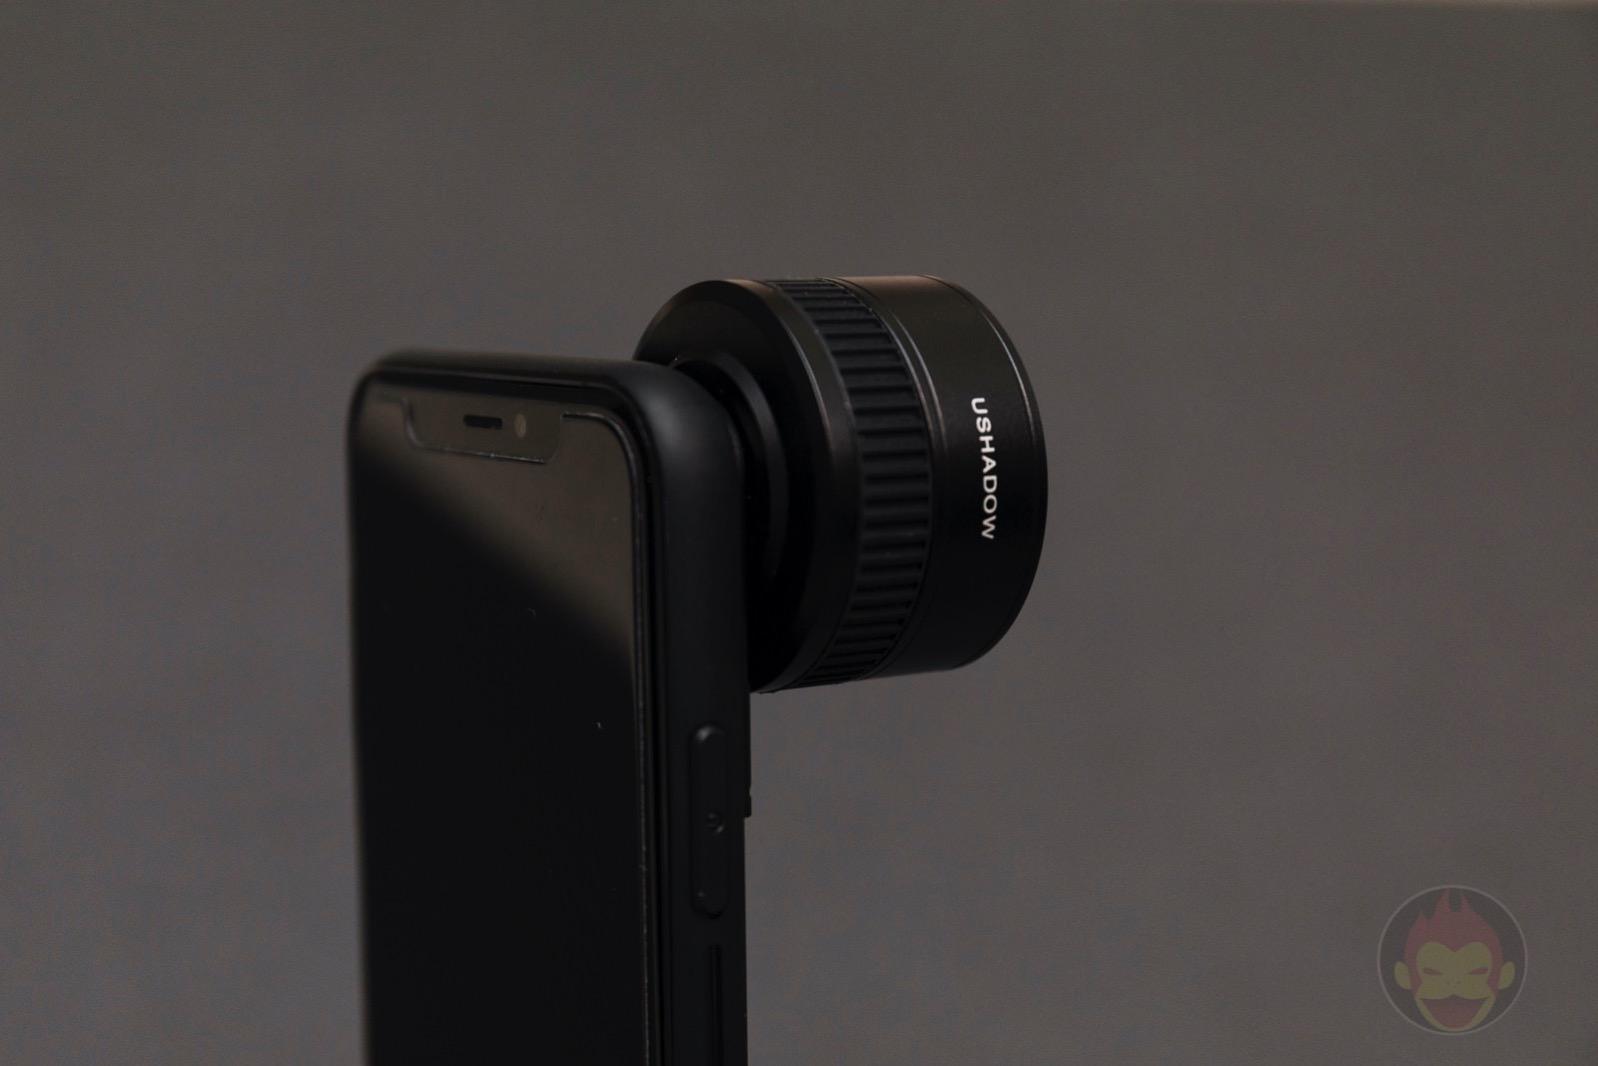 USHADOW-X1-Lens-System-Review-19.jpg